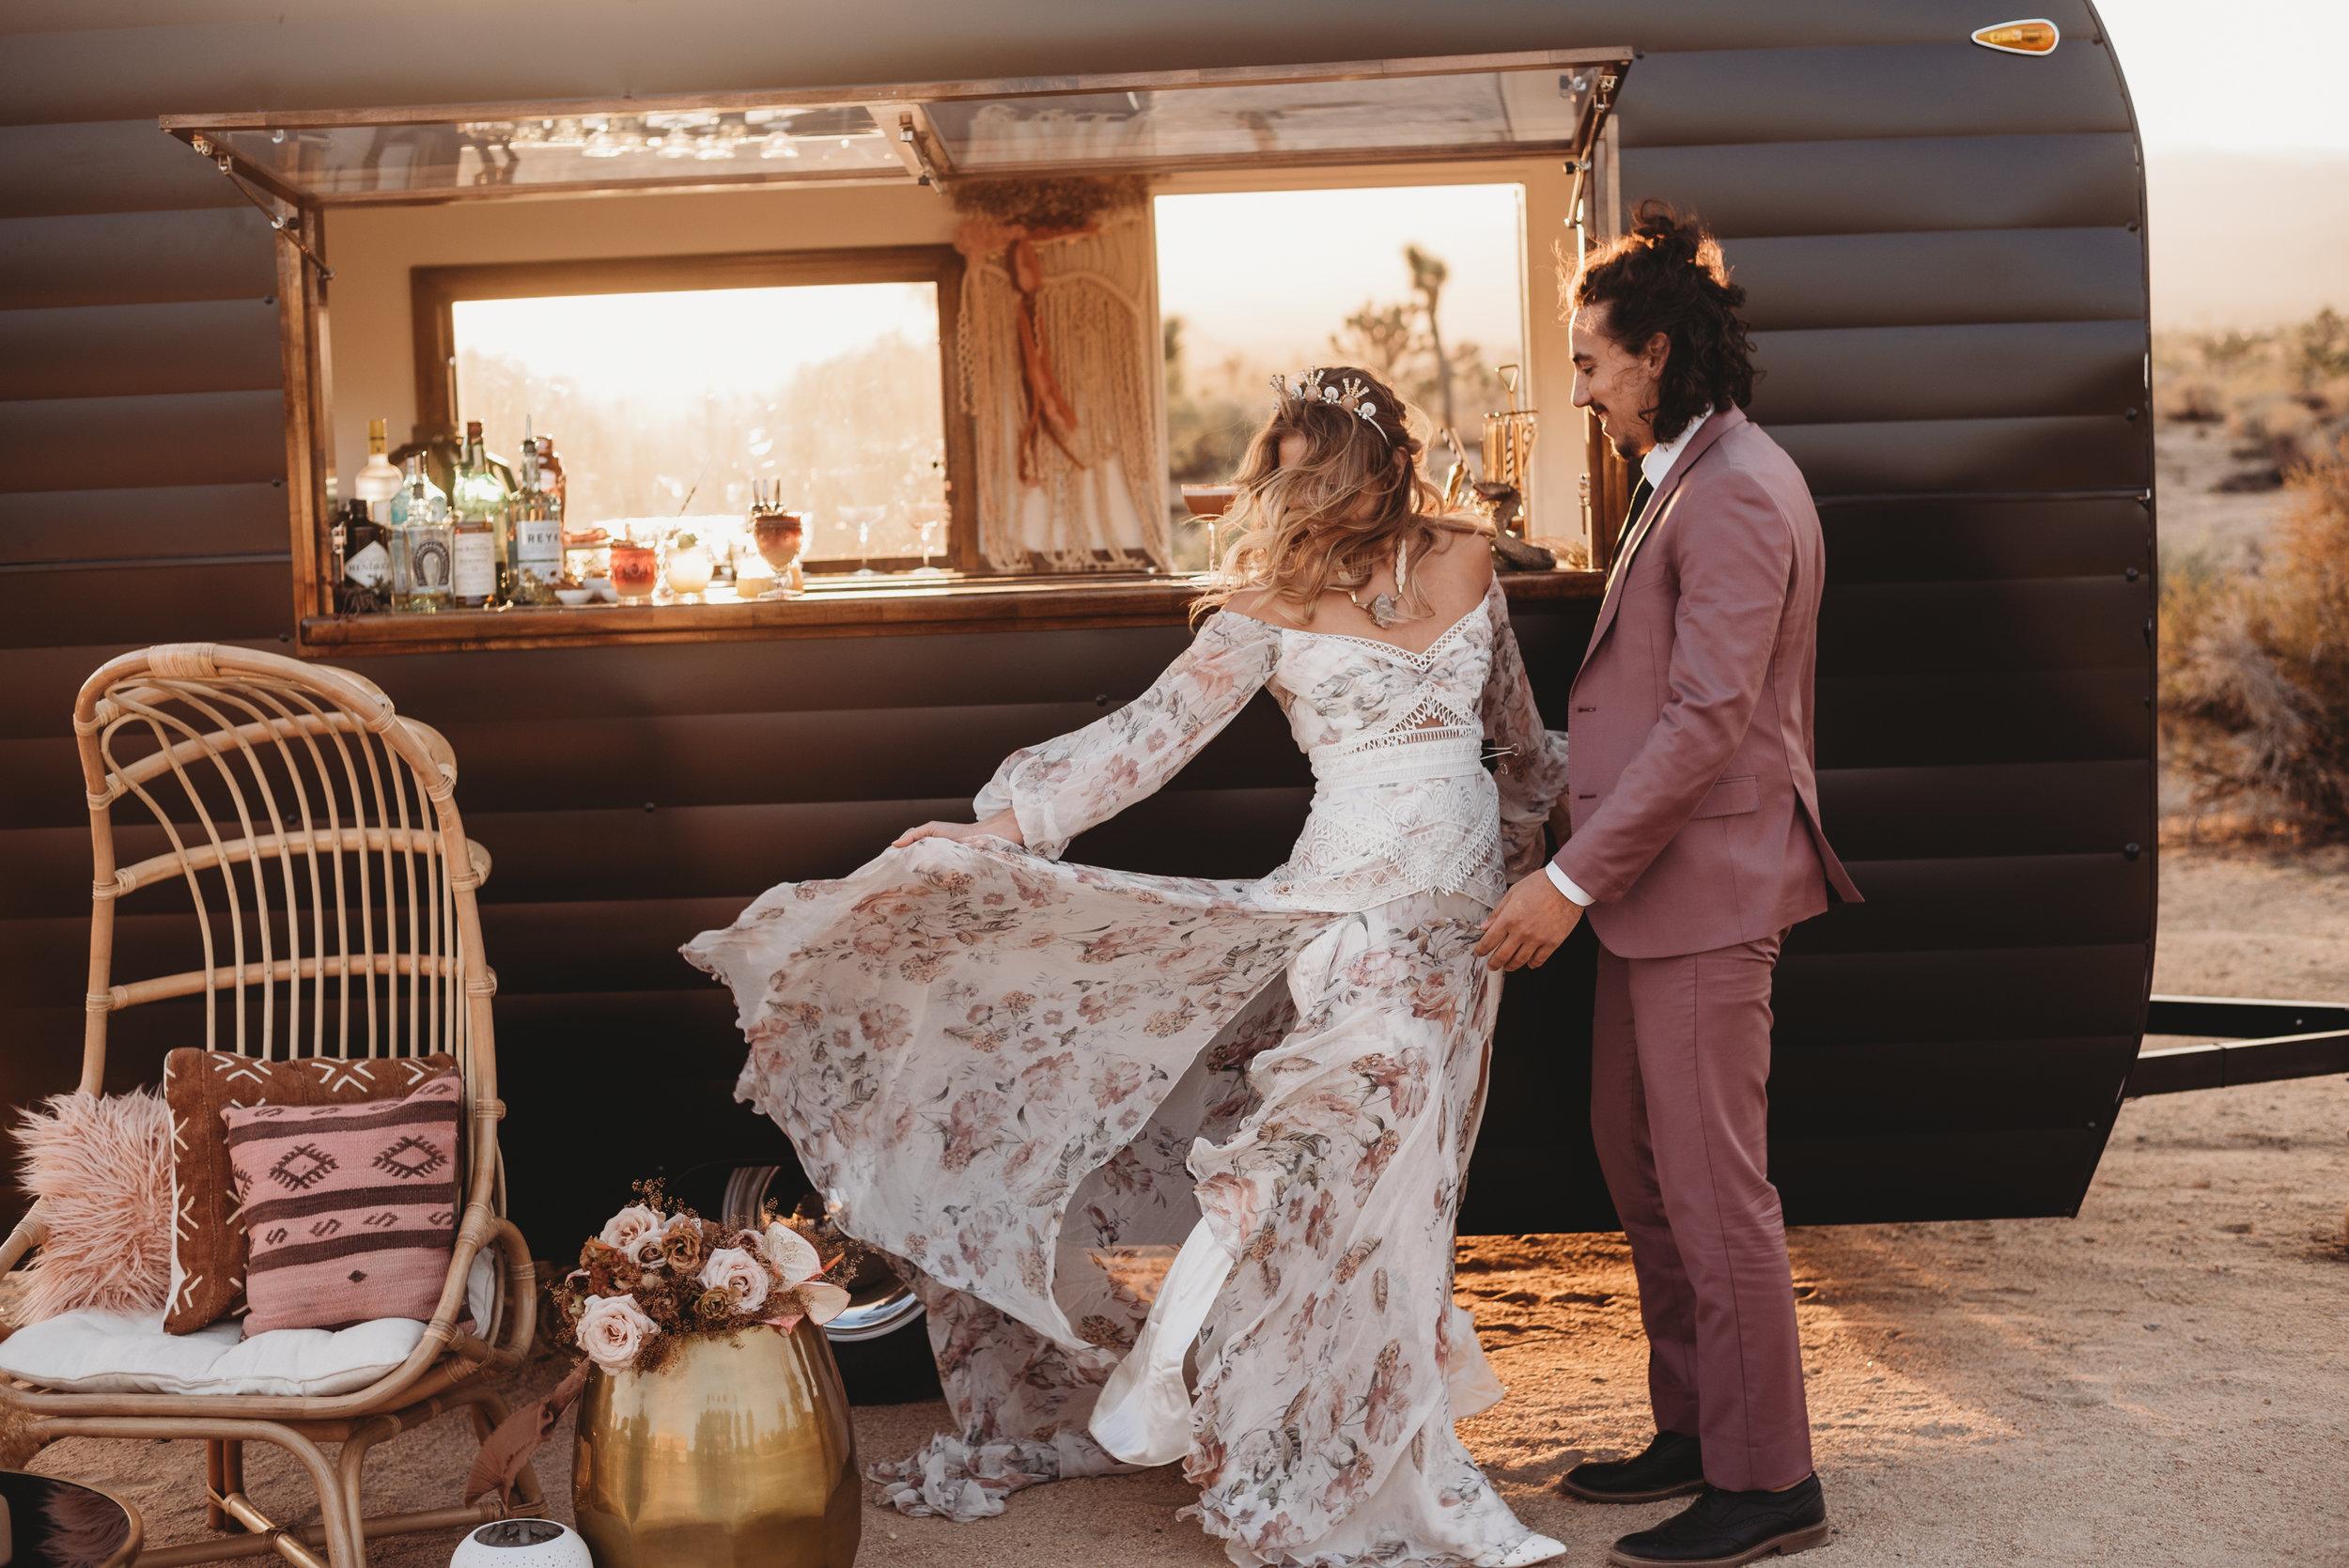 FortSt.John_photographer_TyraEPhotography_Wedding_Couple_Family_Photograhy_DawsonCreek_Elopement_Bride_Boduoir_Portraits-8373.jpg